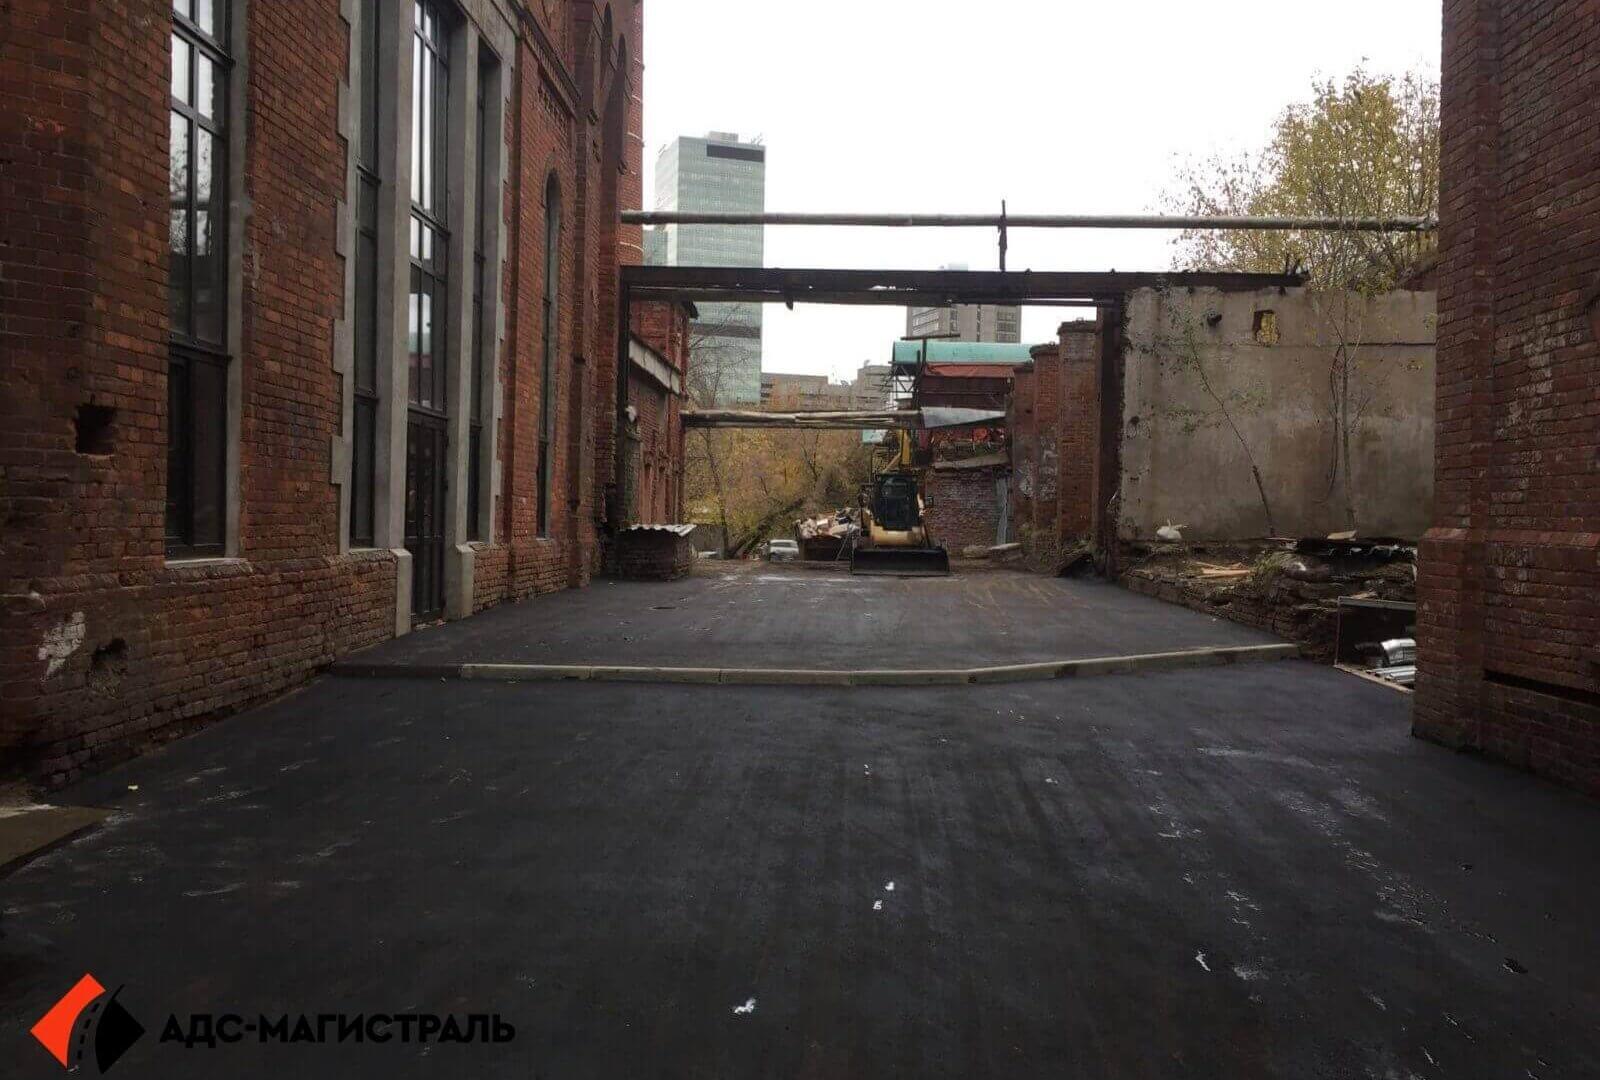 Укладка асфальта на территории завода фото 7